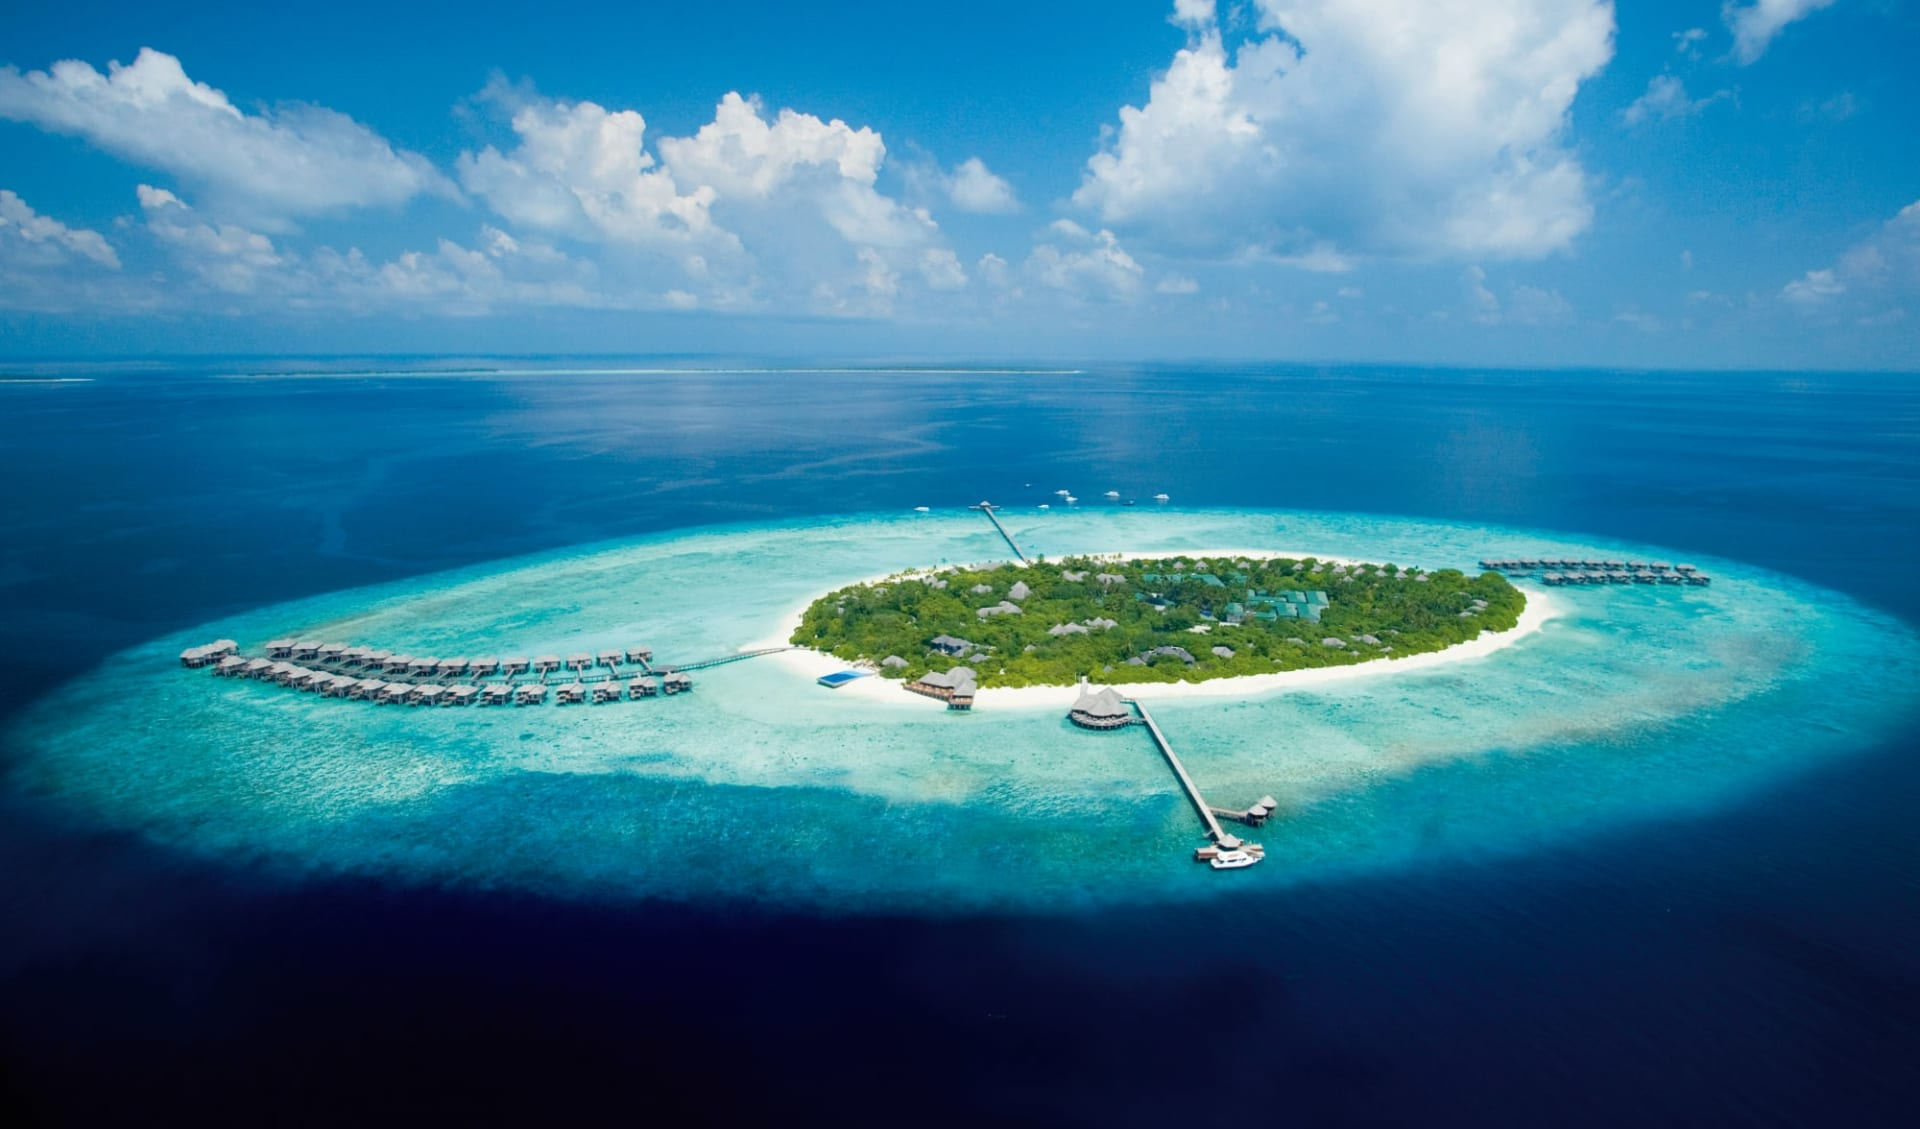 JA Manafaru in Haa Alifu-Atoll: Haa Alifu-Atoll